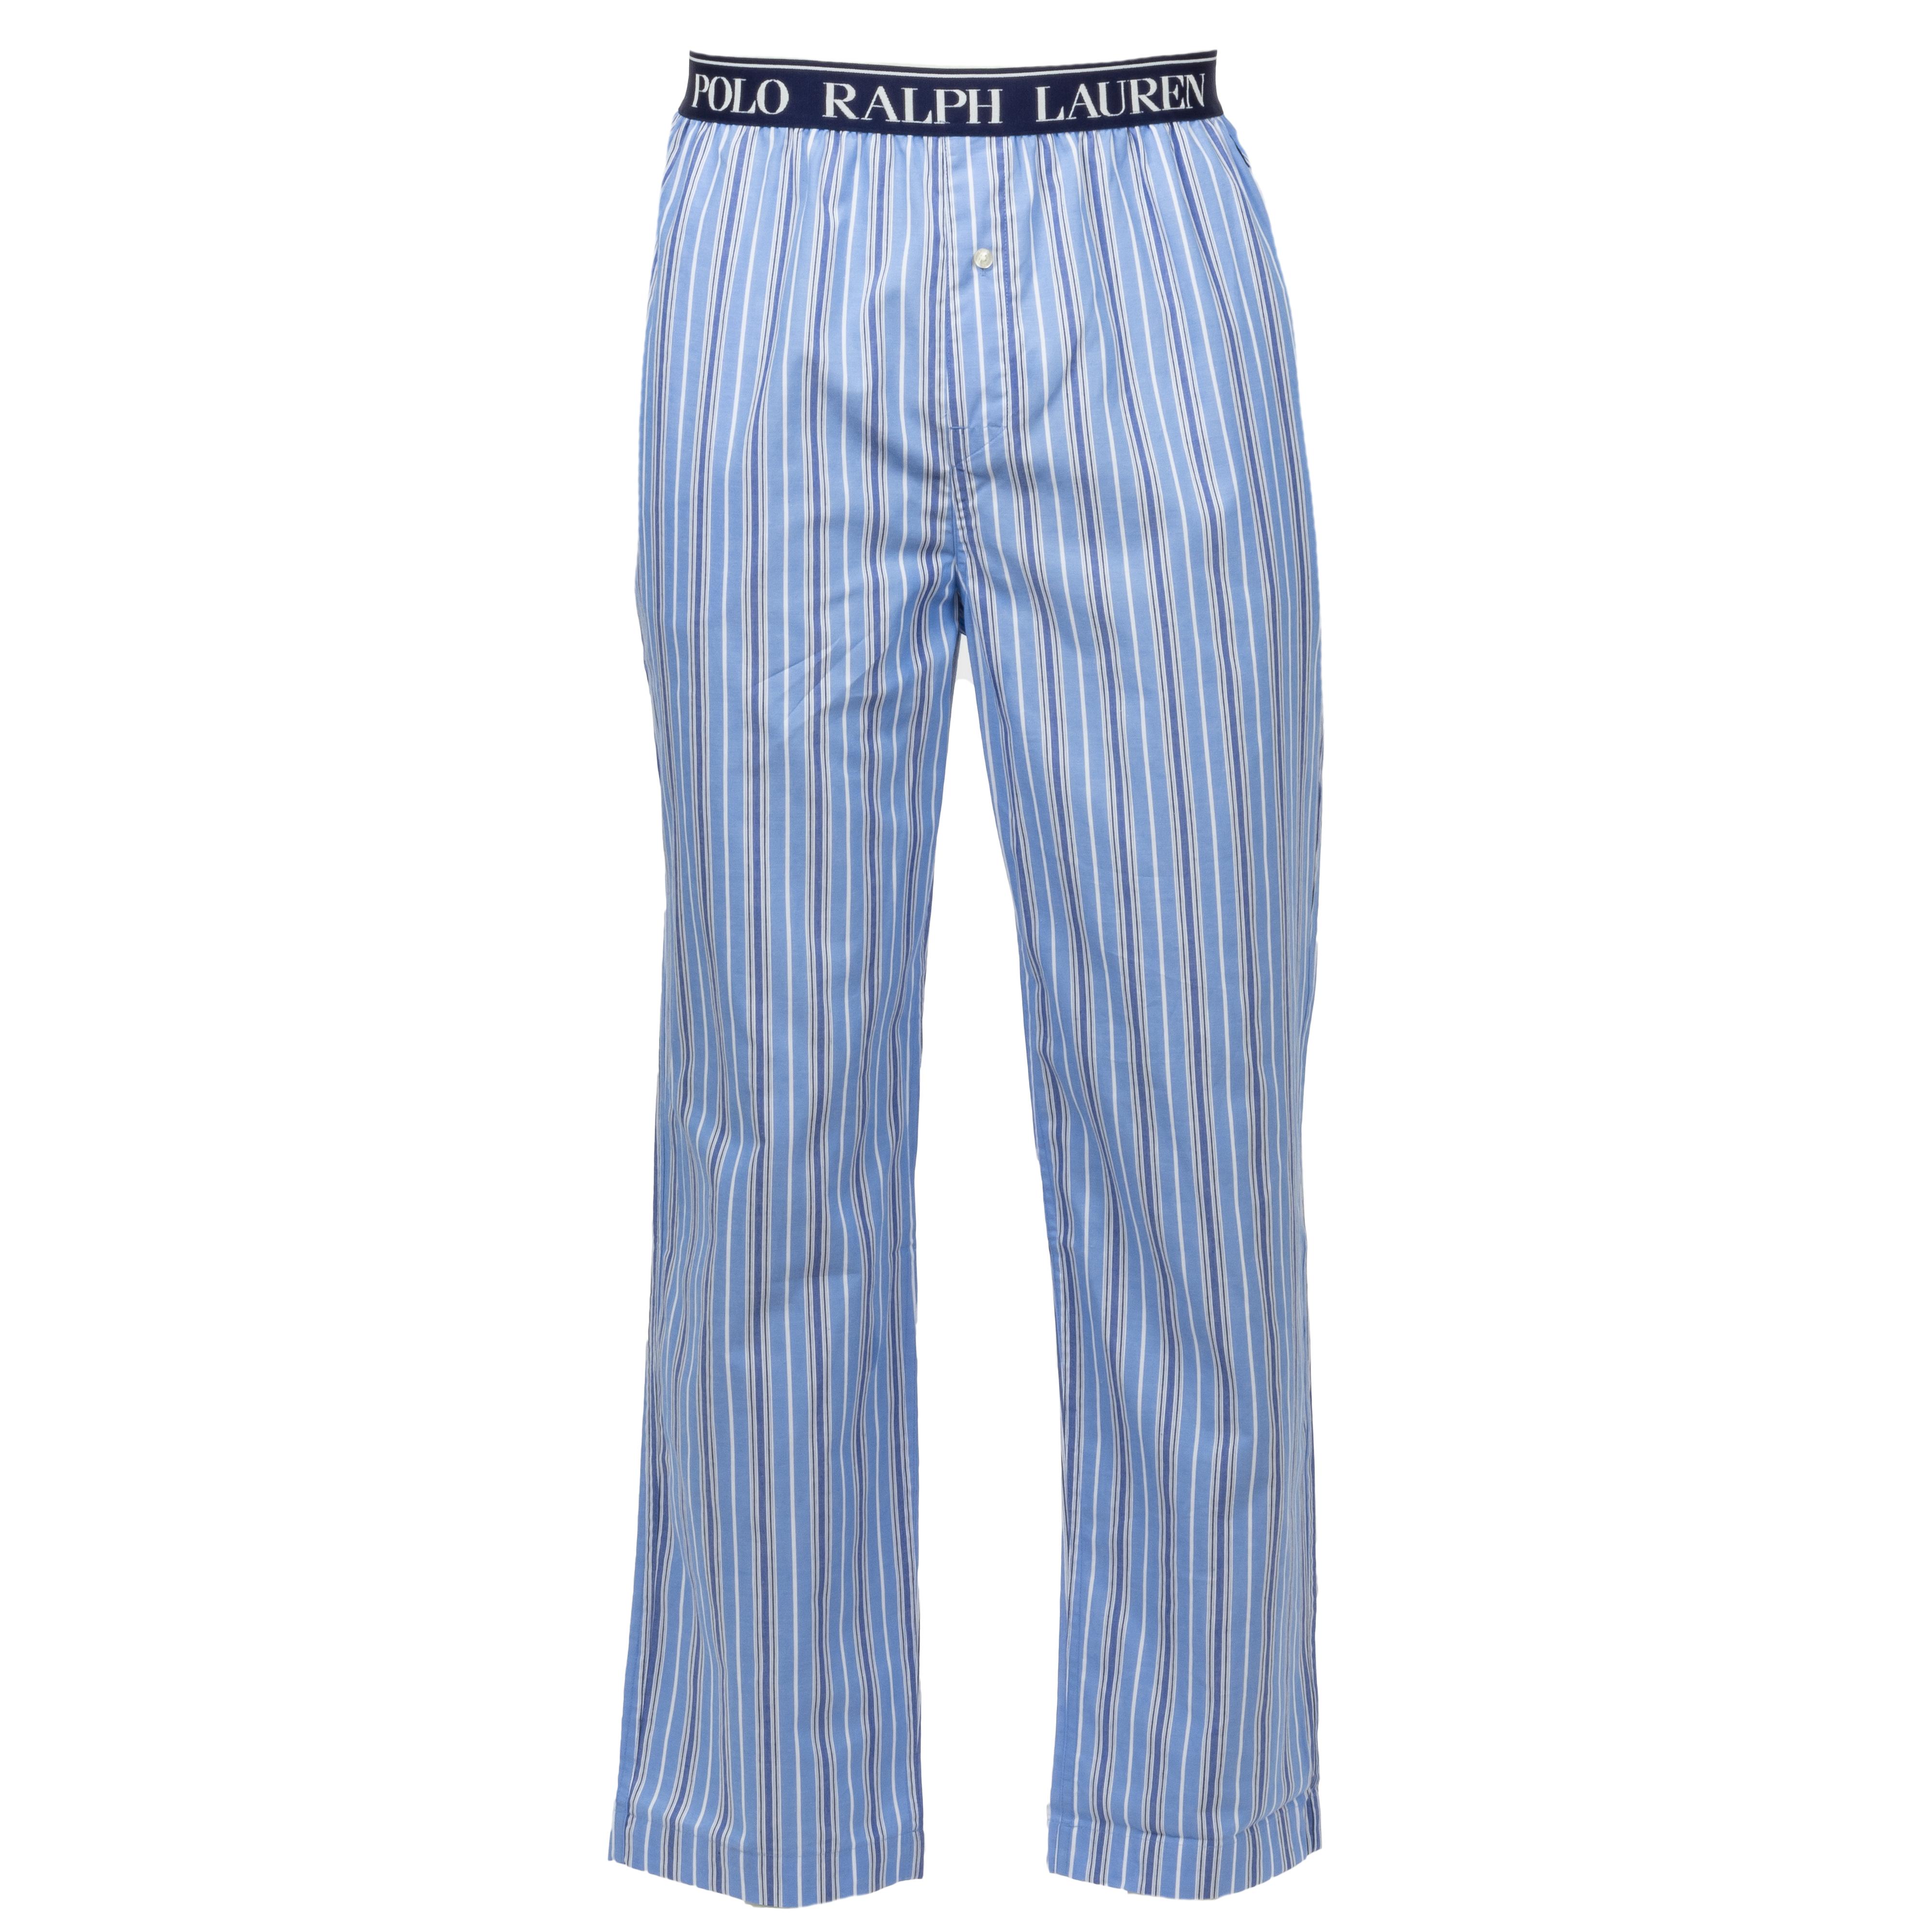 Pantalon de pyjama  en coton bleu ciel à fines rayures verticales